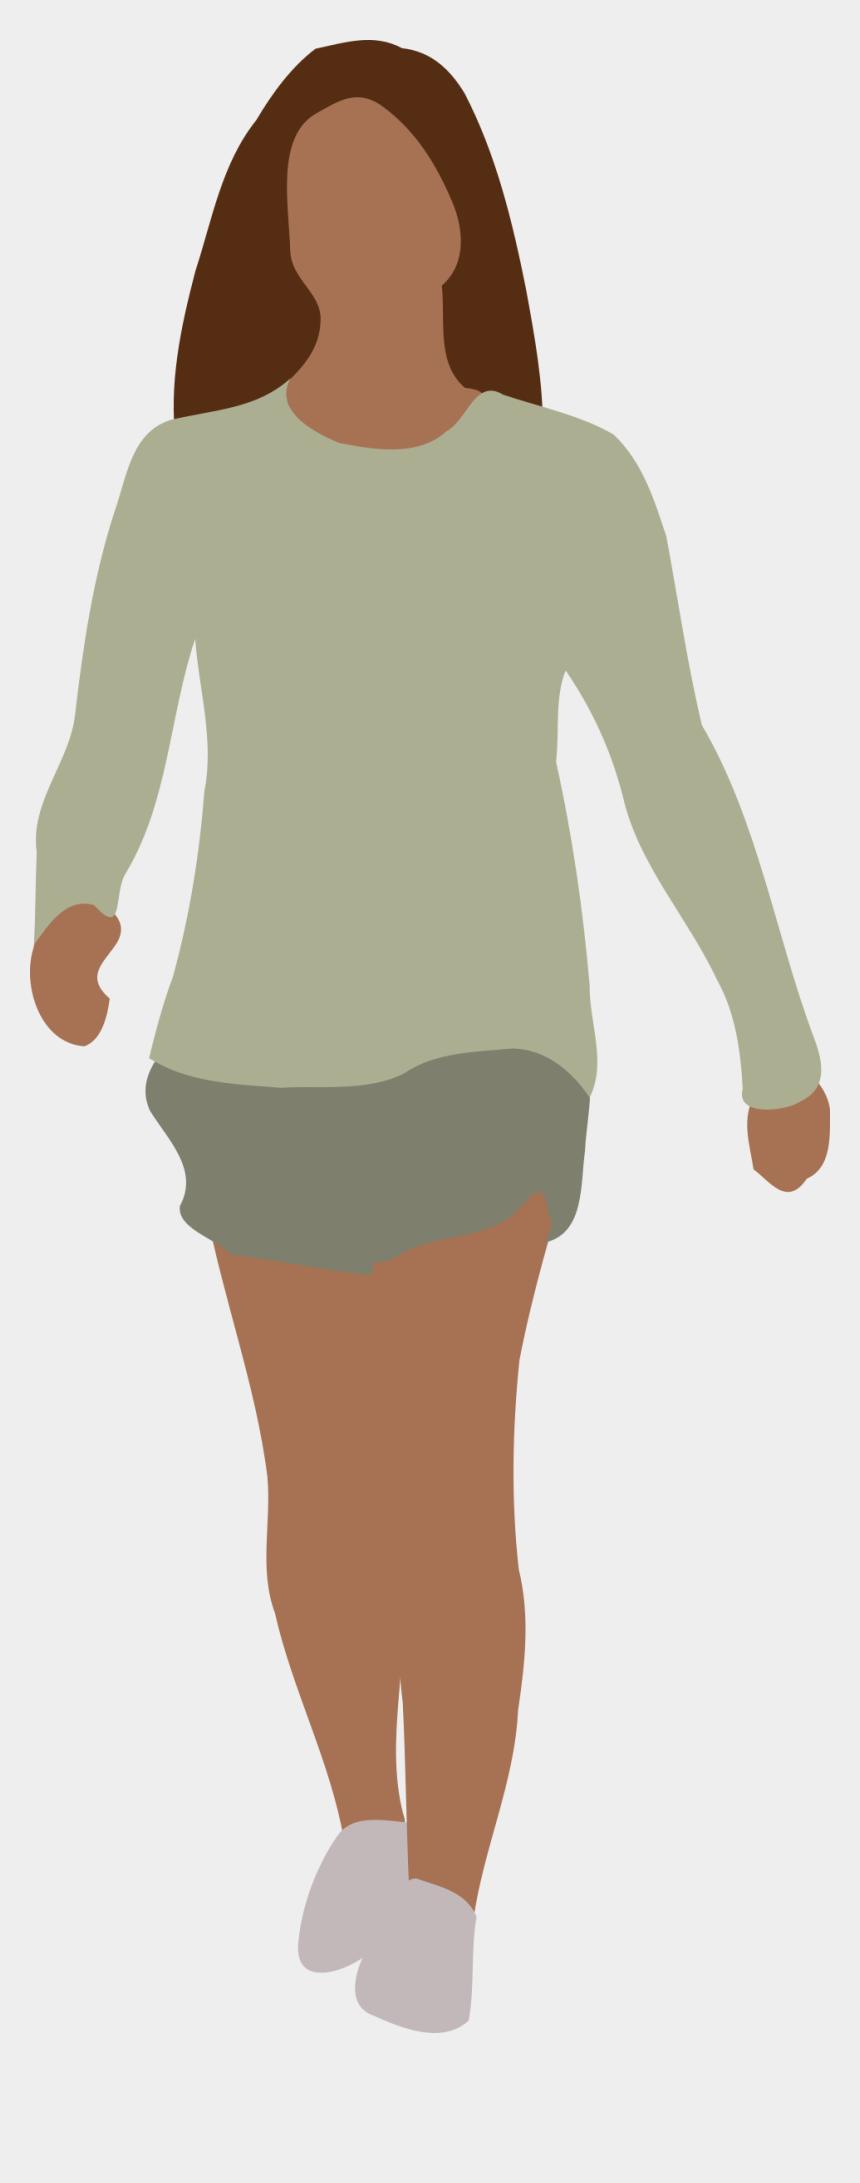 walking clip art, Cartoons - Faceless Woman Walking - Walking Woman Gif Png